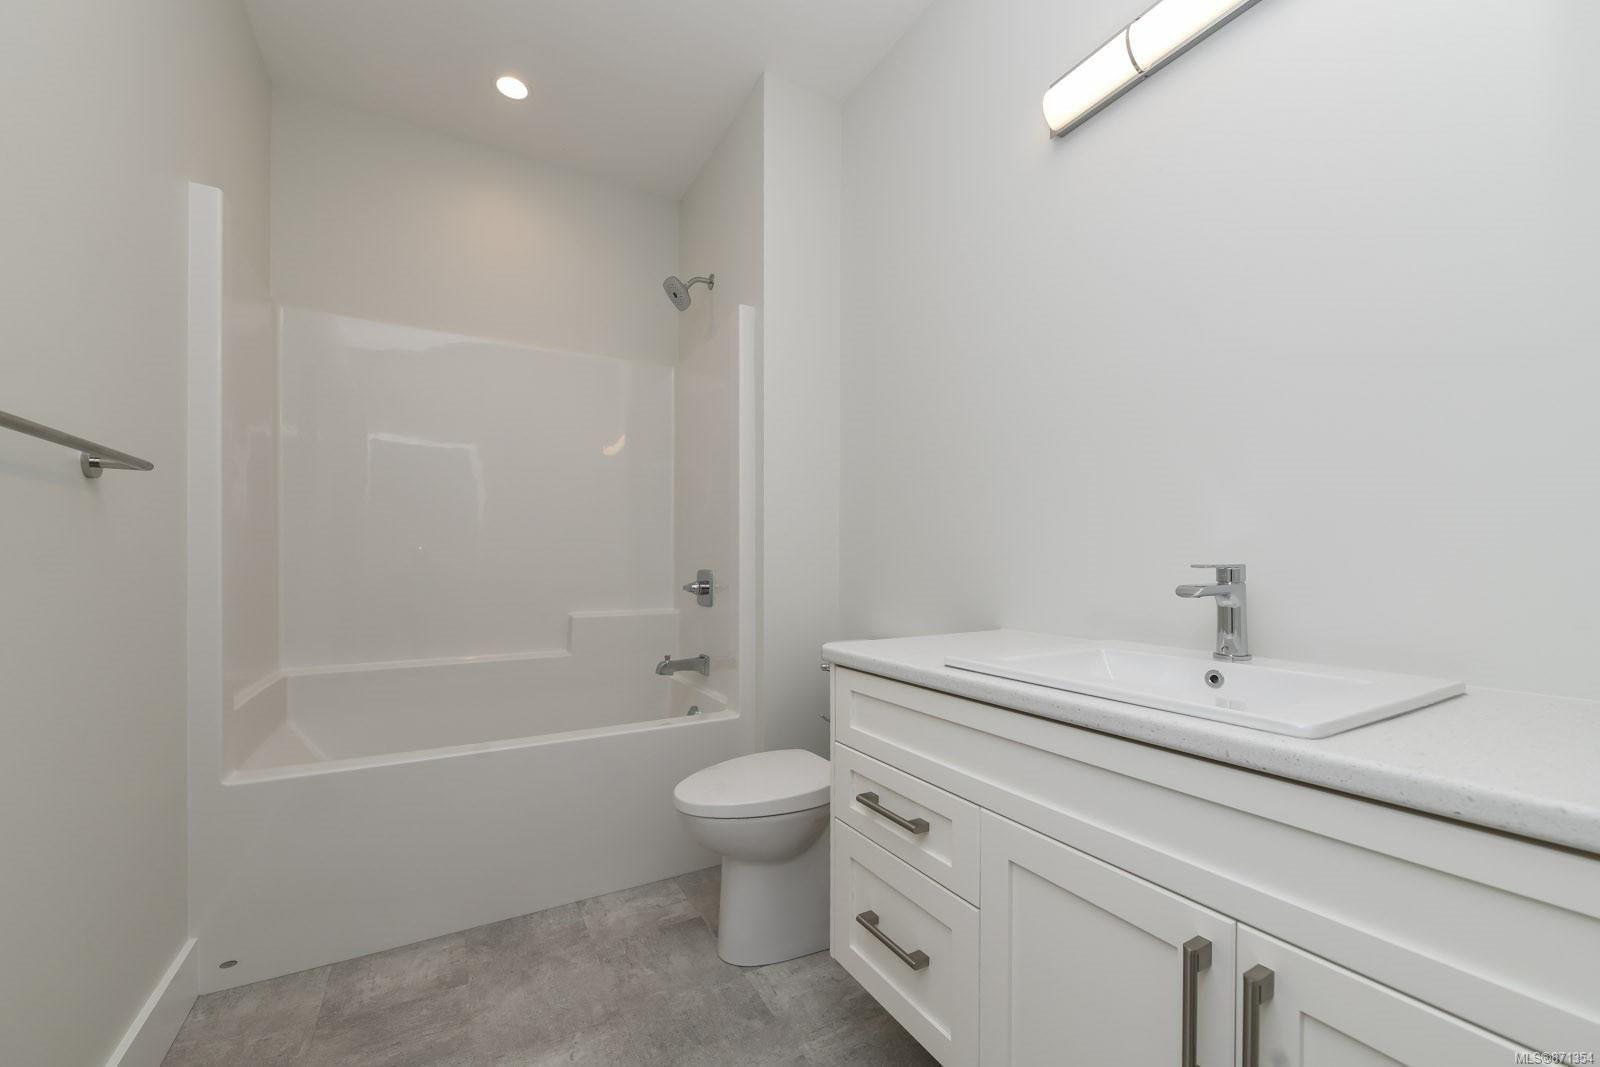 Photo 20: Photos: 68 Grayhawk Pl in : CV Courtenay City House for sale (Comox Valley)  : MLS®# 871354